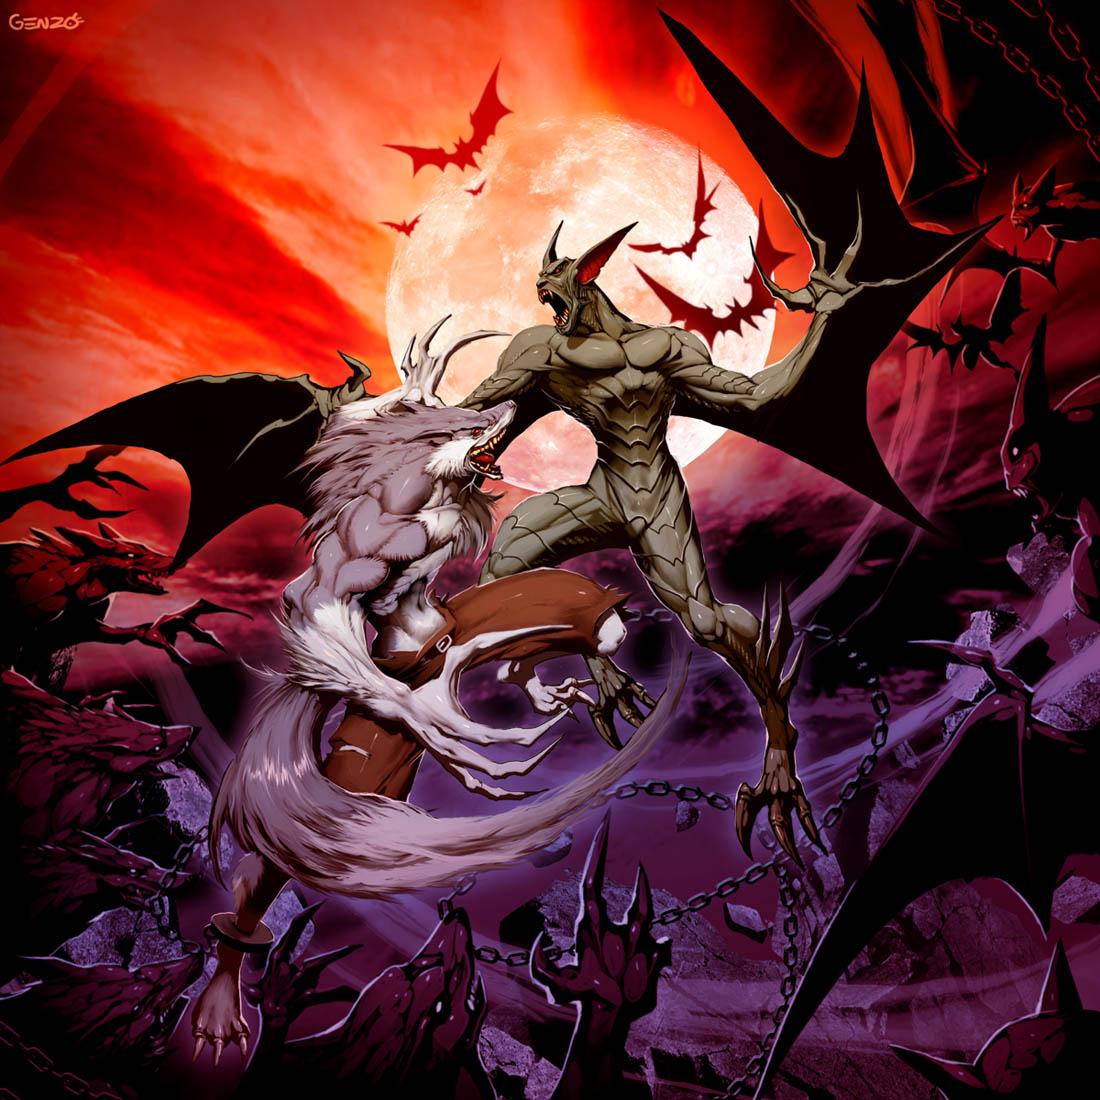 http://1.bp.blogspot.com/_m8efKQVNSK0/TD36_zSePnI/AAAAAAAAAKU/7nlNz5lRaPE/s1600/Vampire_VS_Werewolf_by_GENZOMAN.jpg